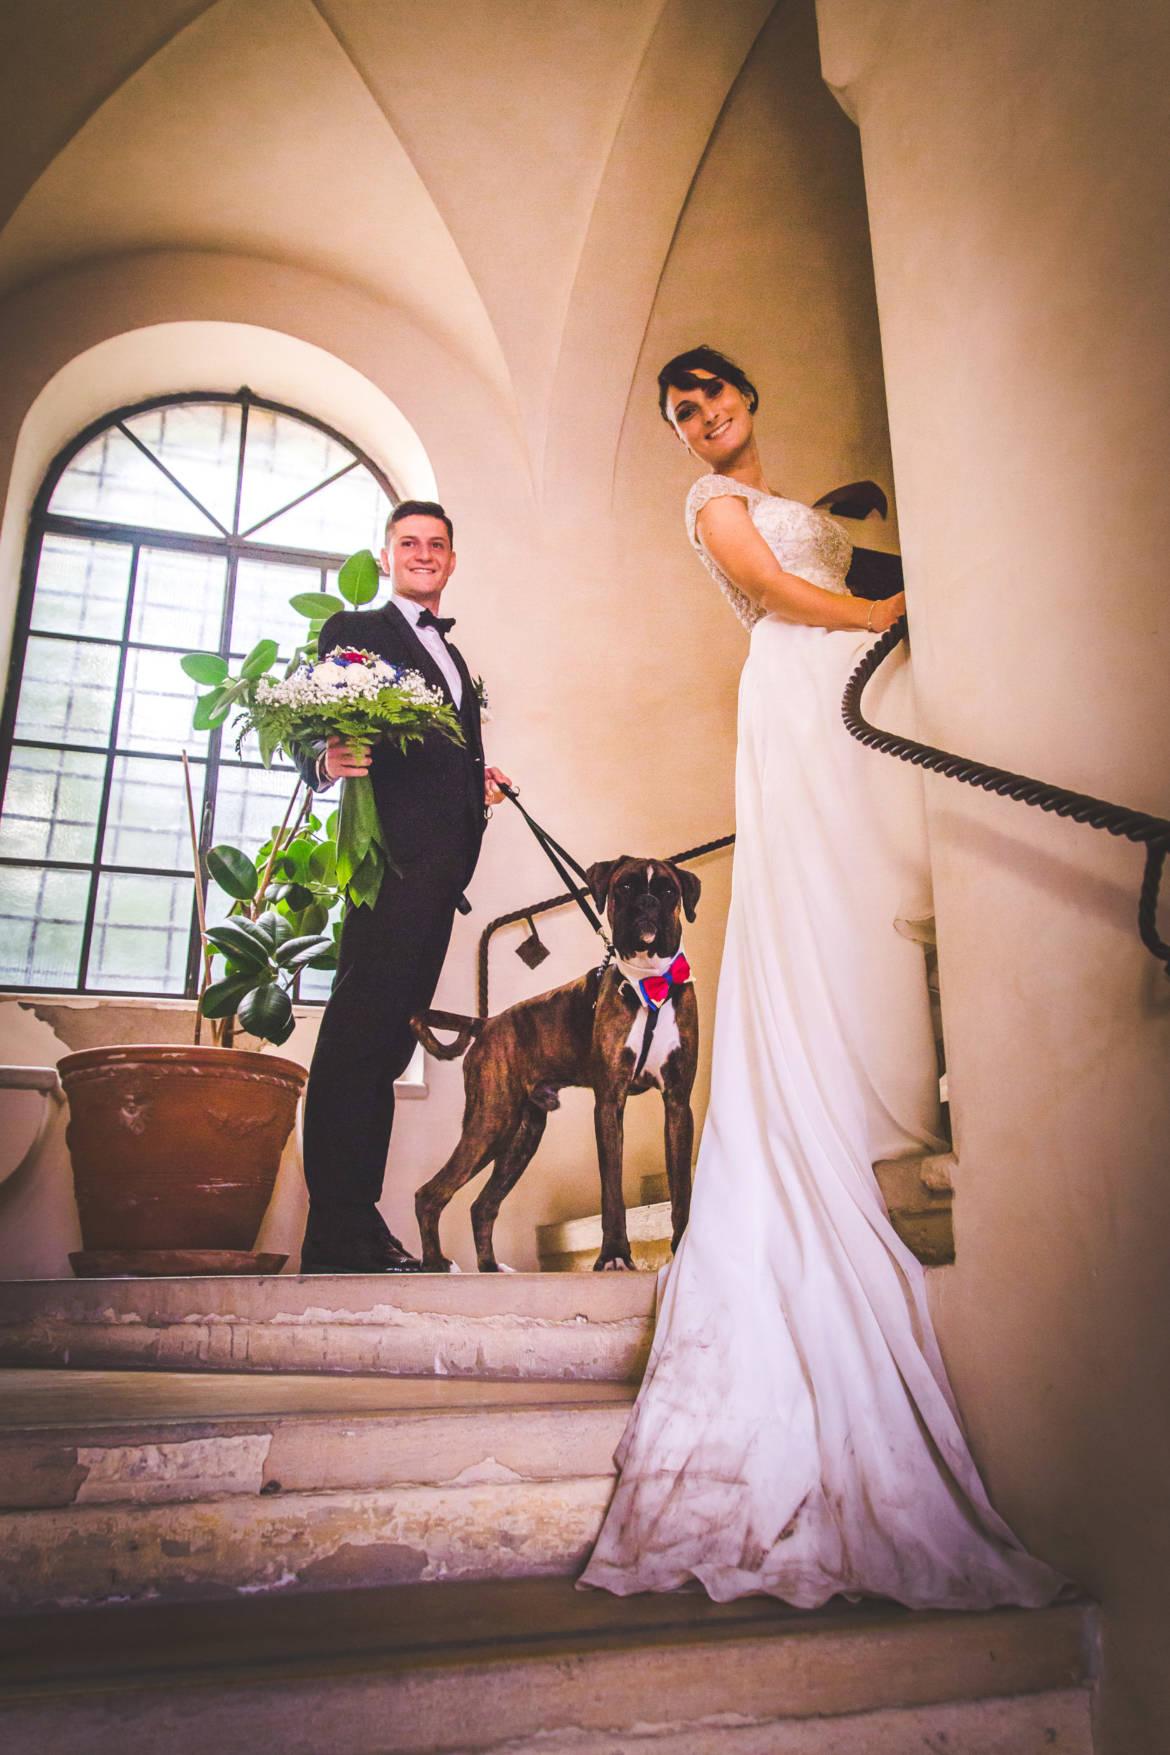 Matrimonio-Daniele-e-Nicoletta-368.jpg